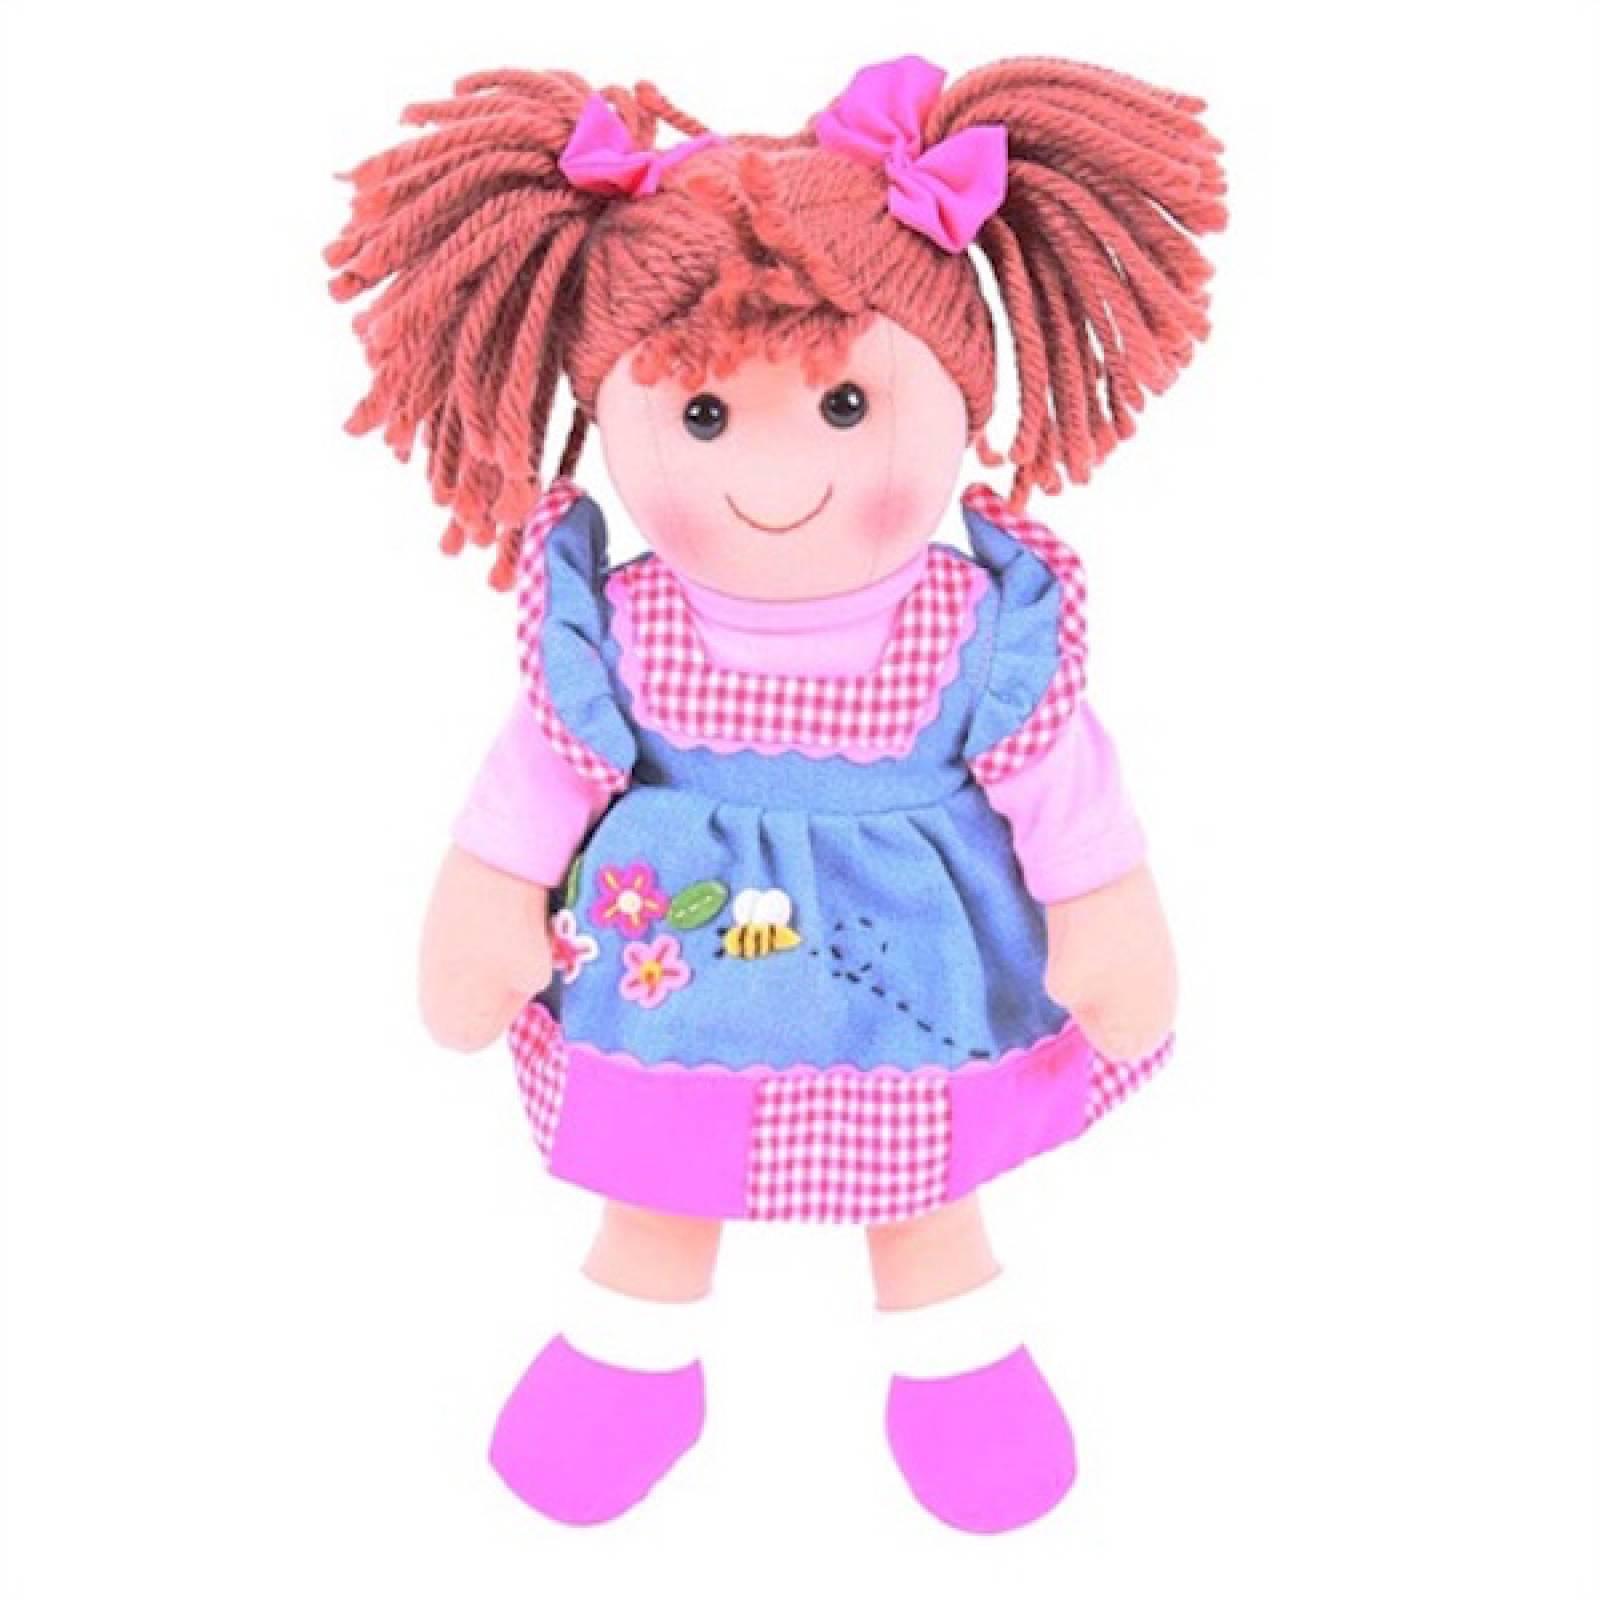 Melody - Traditional Rag Doll 0+